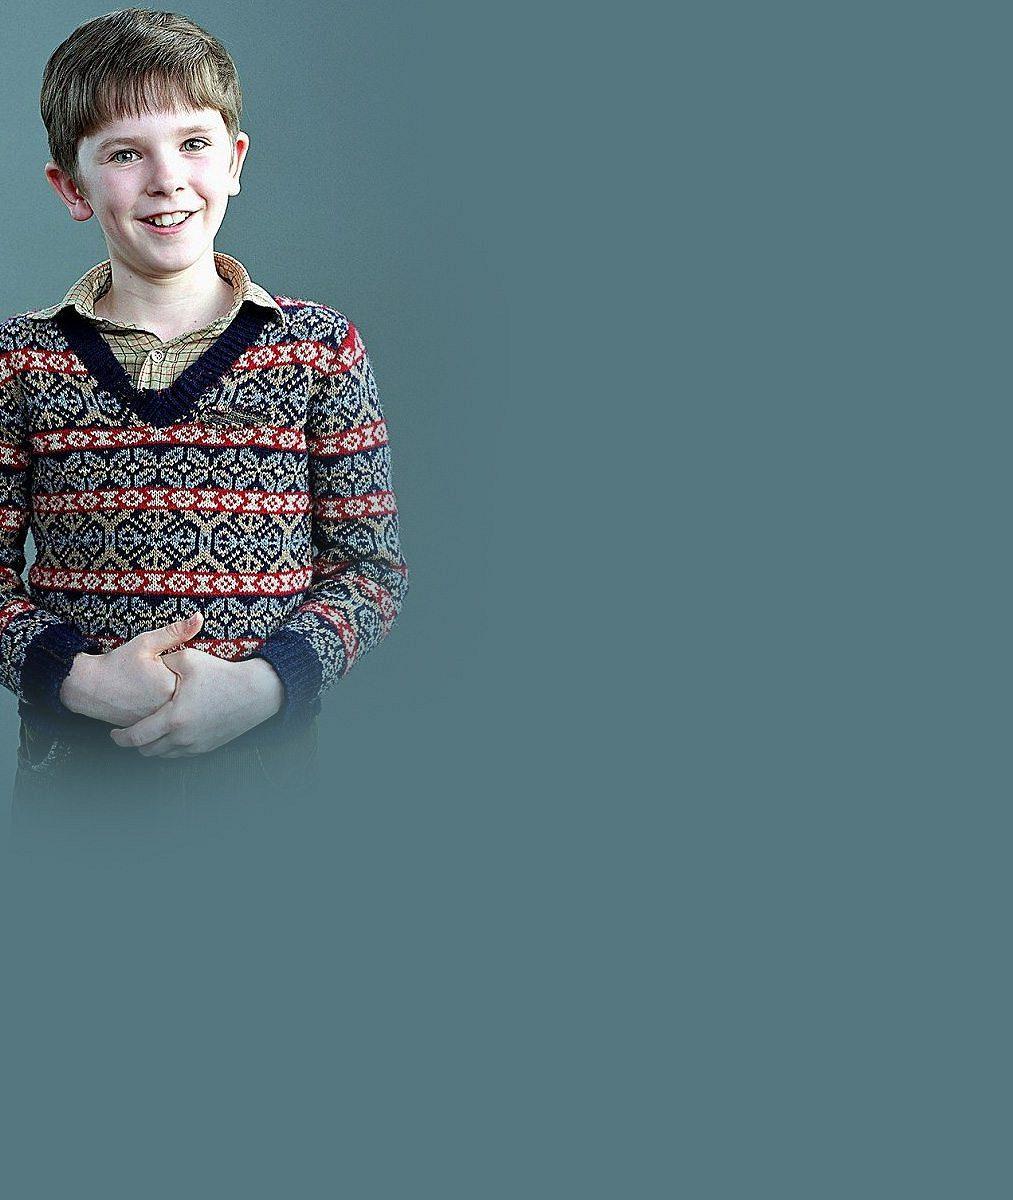 Roztomilý chlapeček z filmu Karlík a továrna na čokoládu dospěl v muže: Takhle mu to sekne ve smokingu